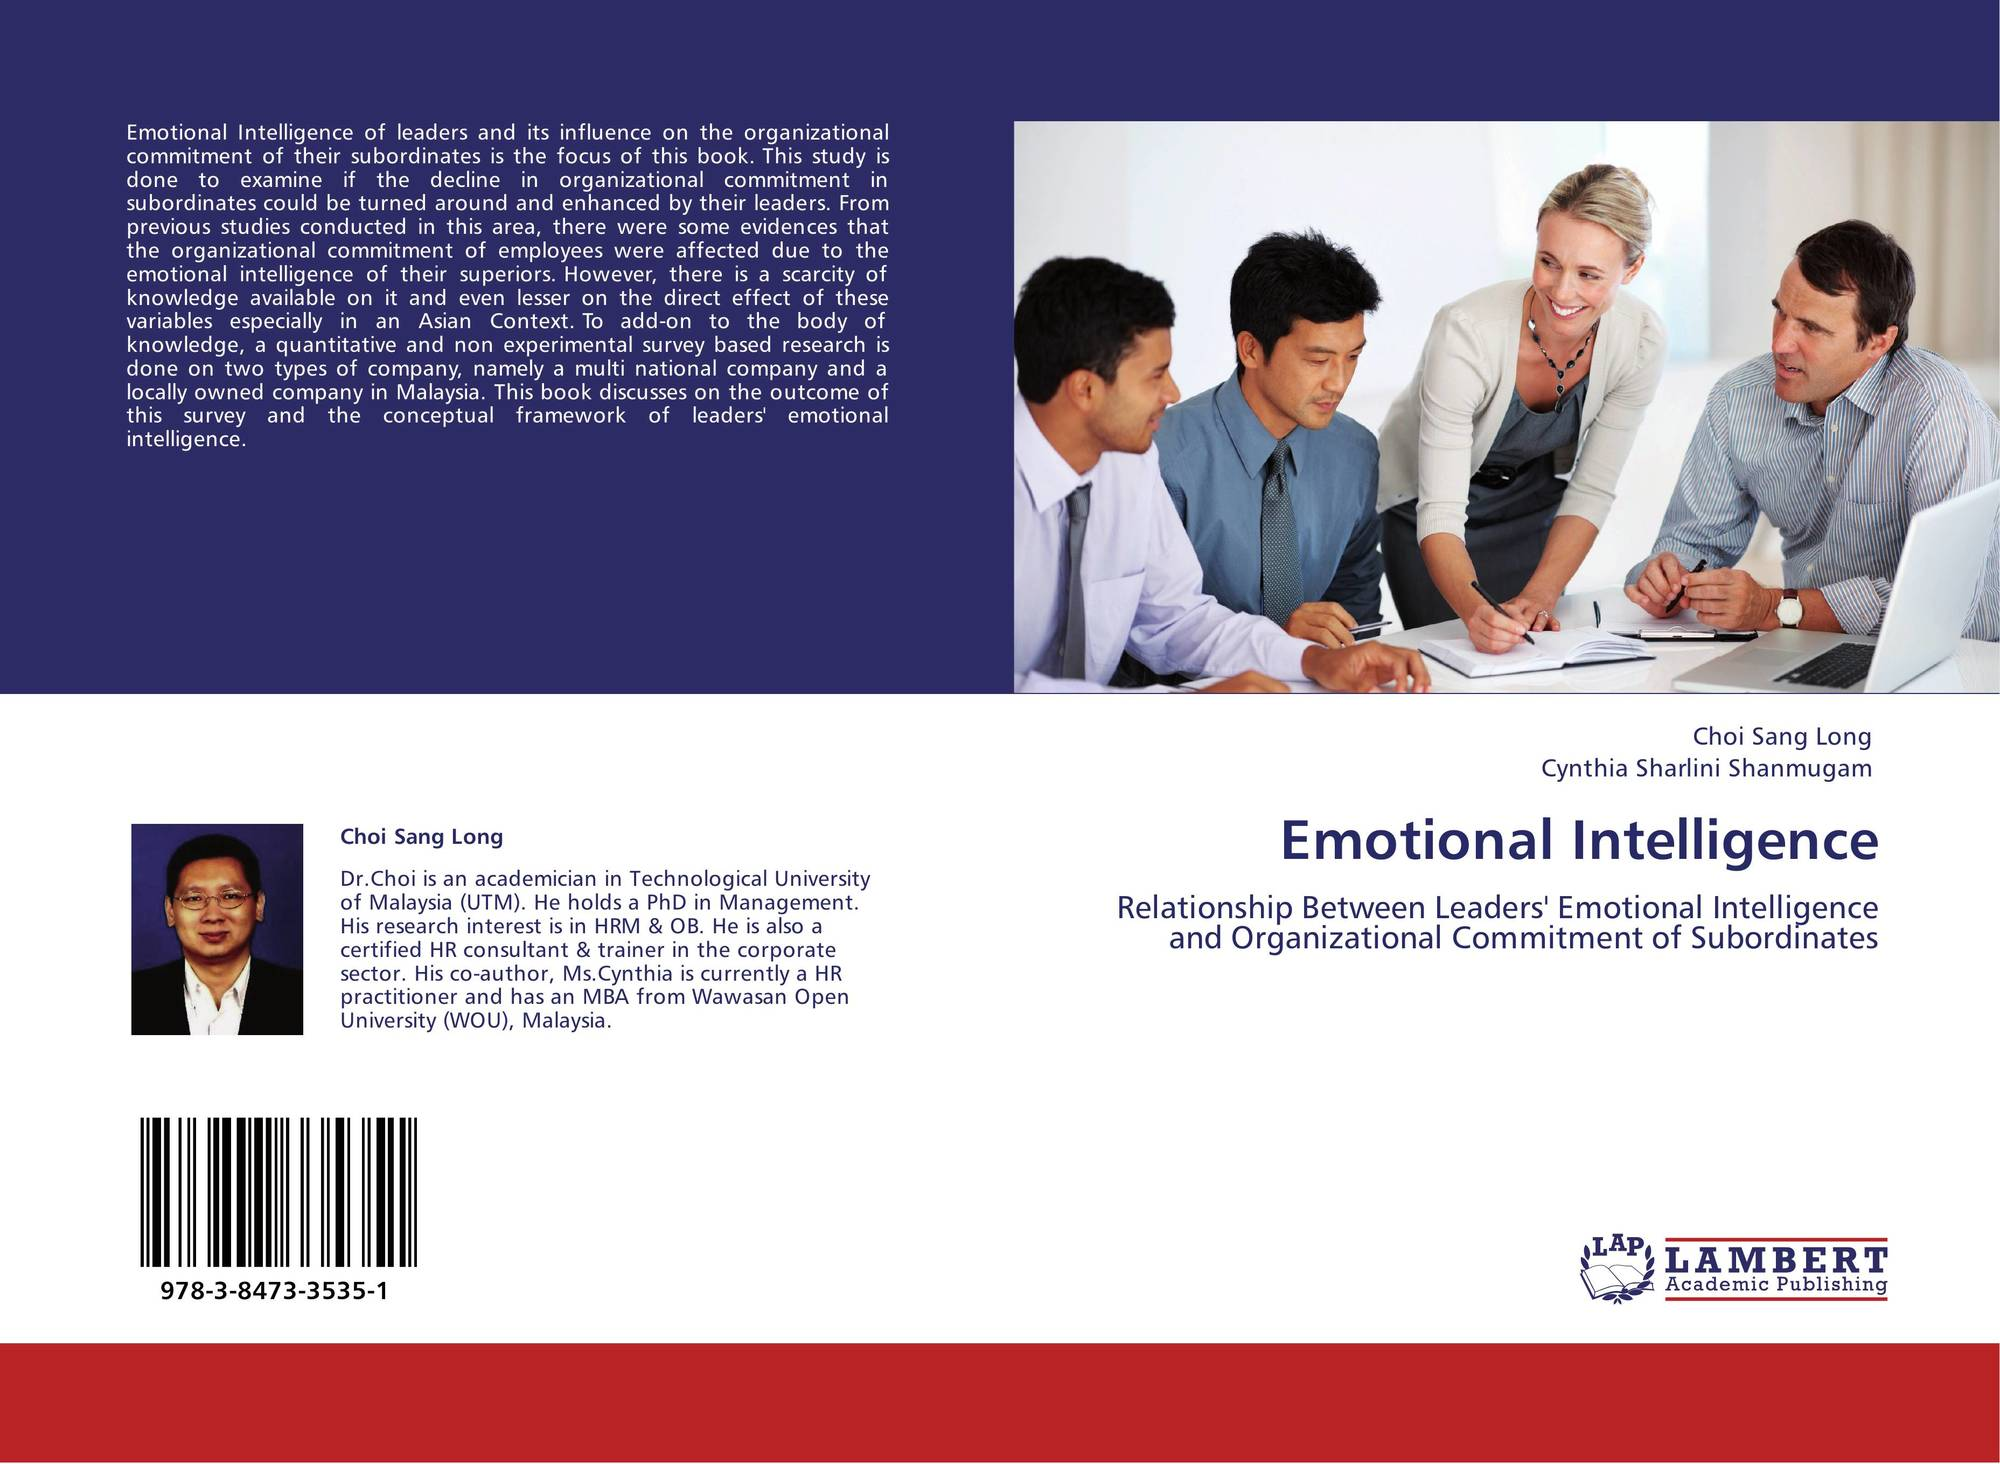 emotional intelligence and organizational performance Between emotional intelligence and employee engagement additional recommendations were made to improve organizational performance through leadership development.